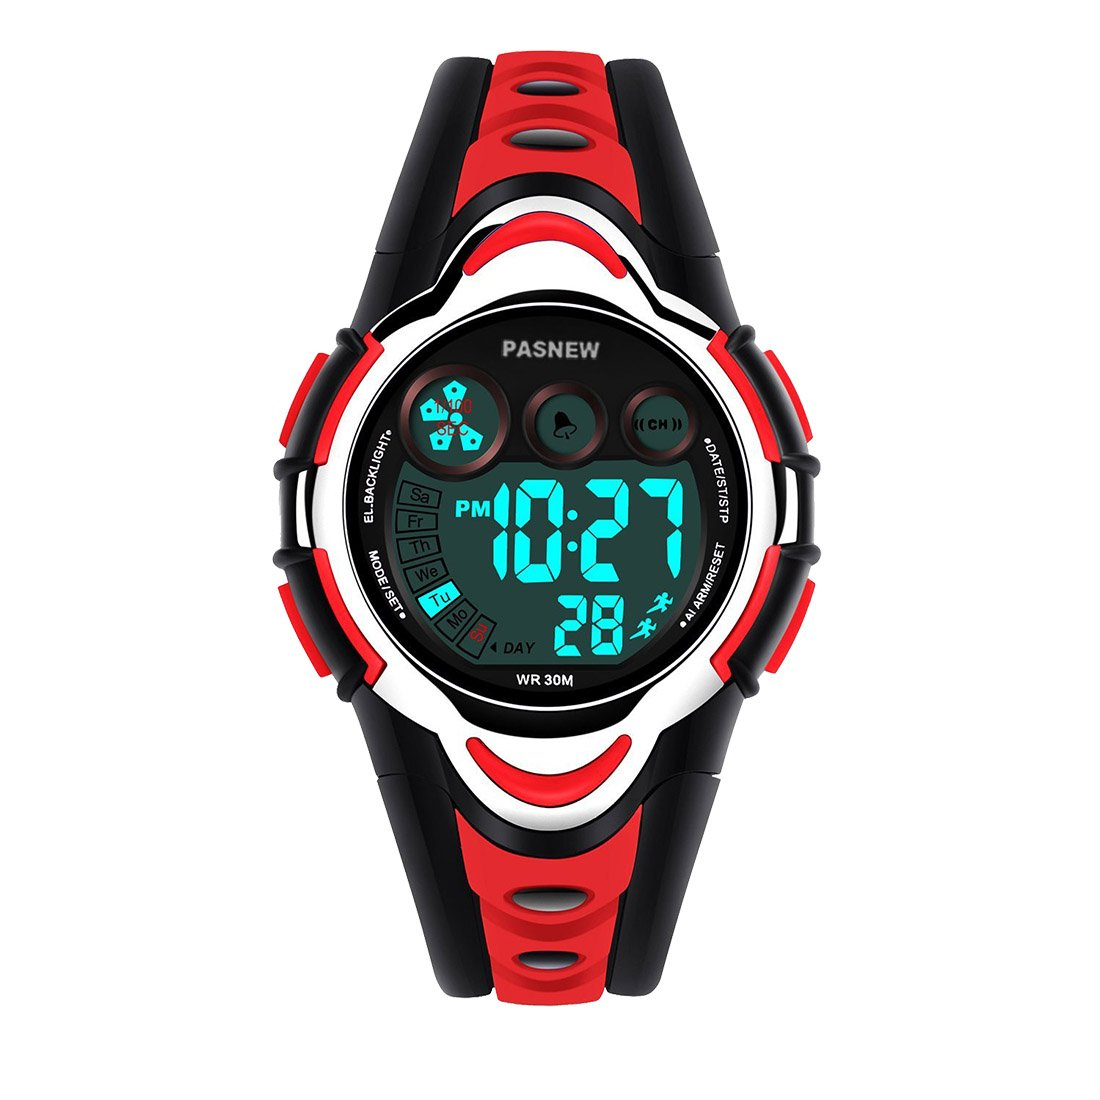 Boys Watches, PASNEW Cool Design Lightweight Waterproof Digital Sports Kids Watch Age 5-12 Red